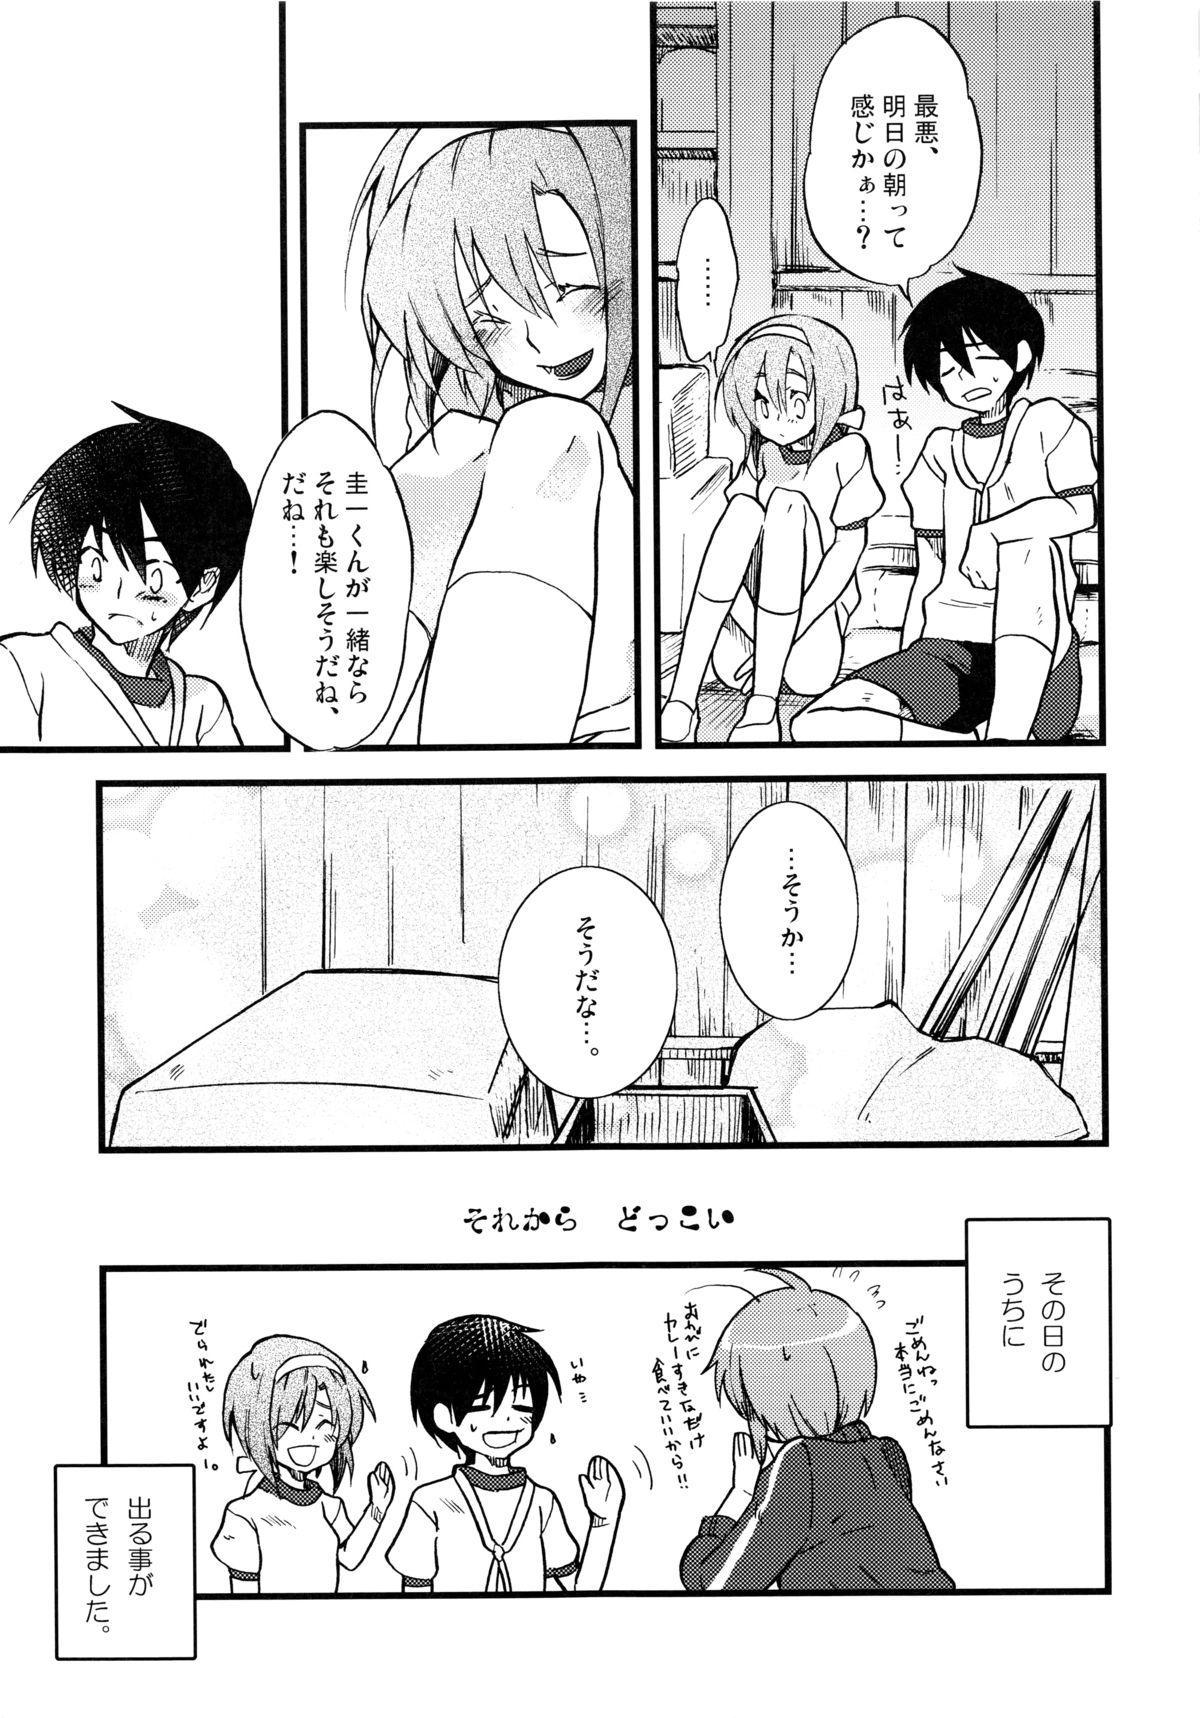 School-mer! School Mizugi Bloomer Joshi Anthology 103